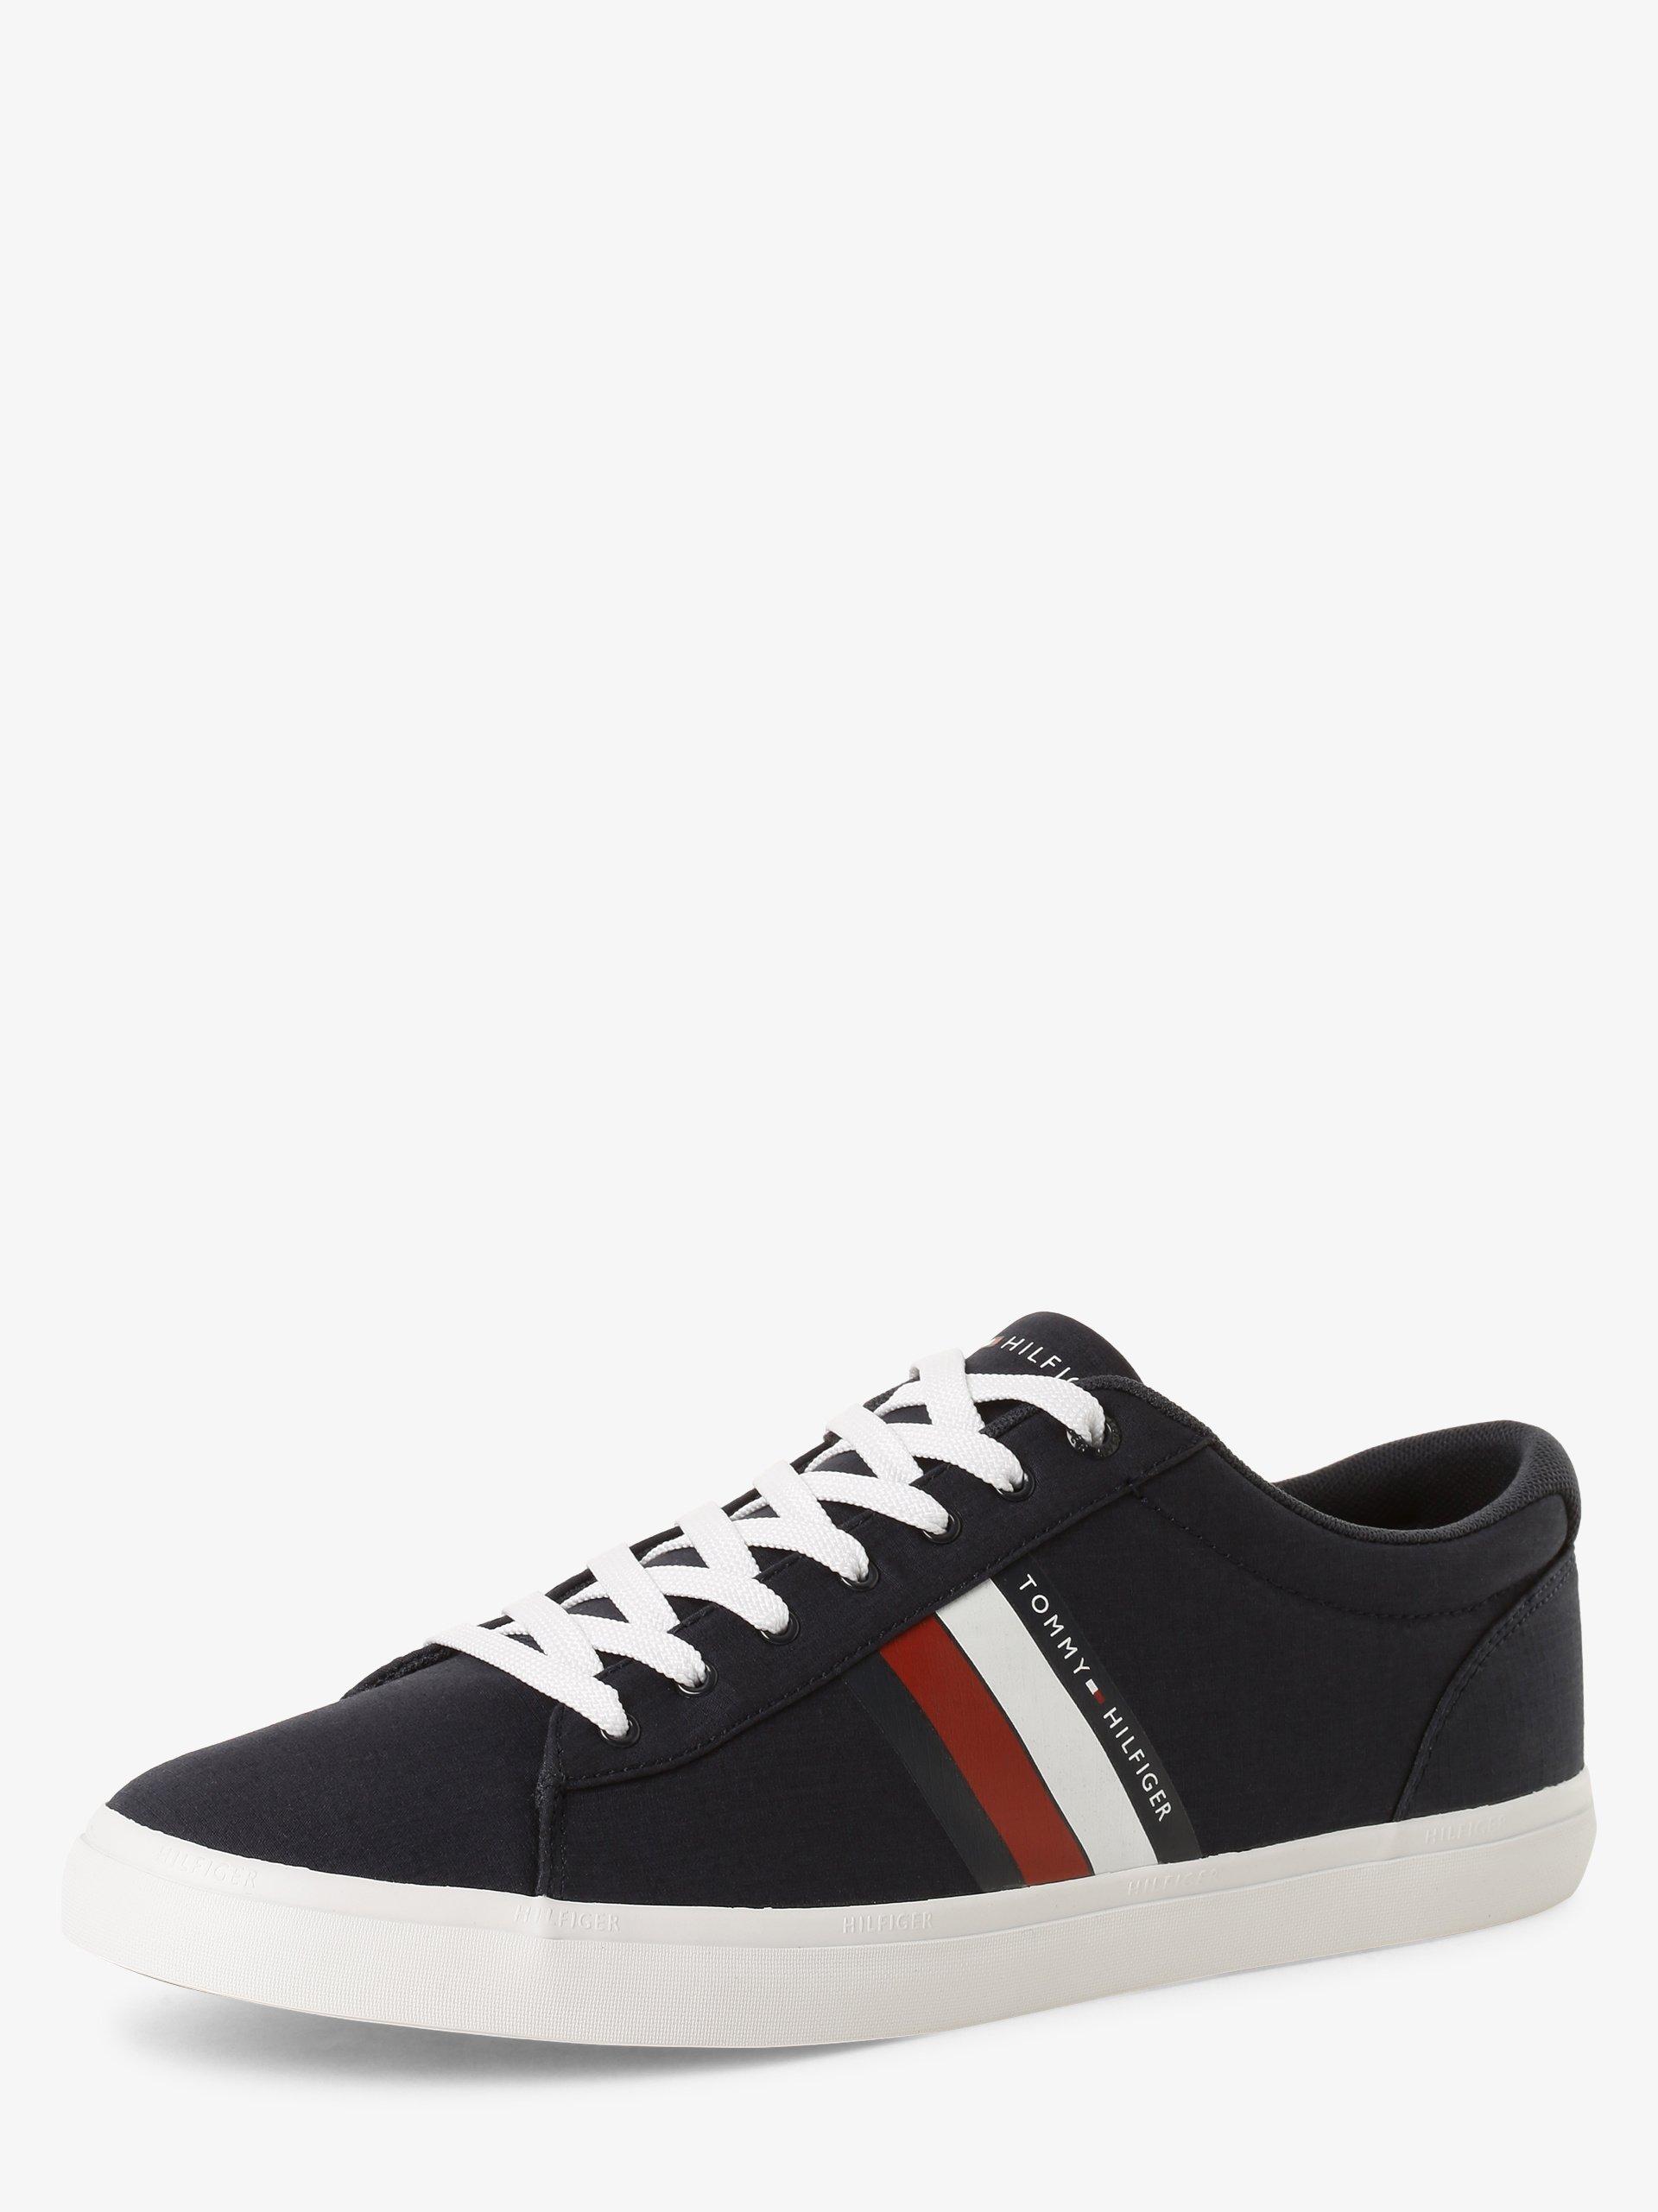 Tommy Hilfiger Herren Sneaker